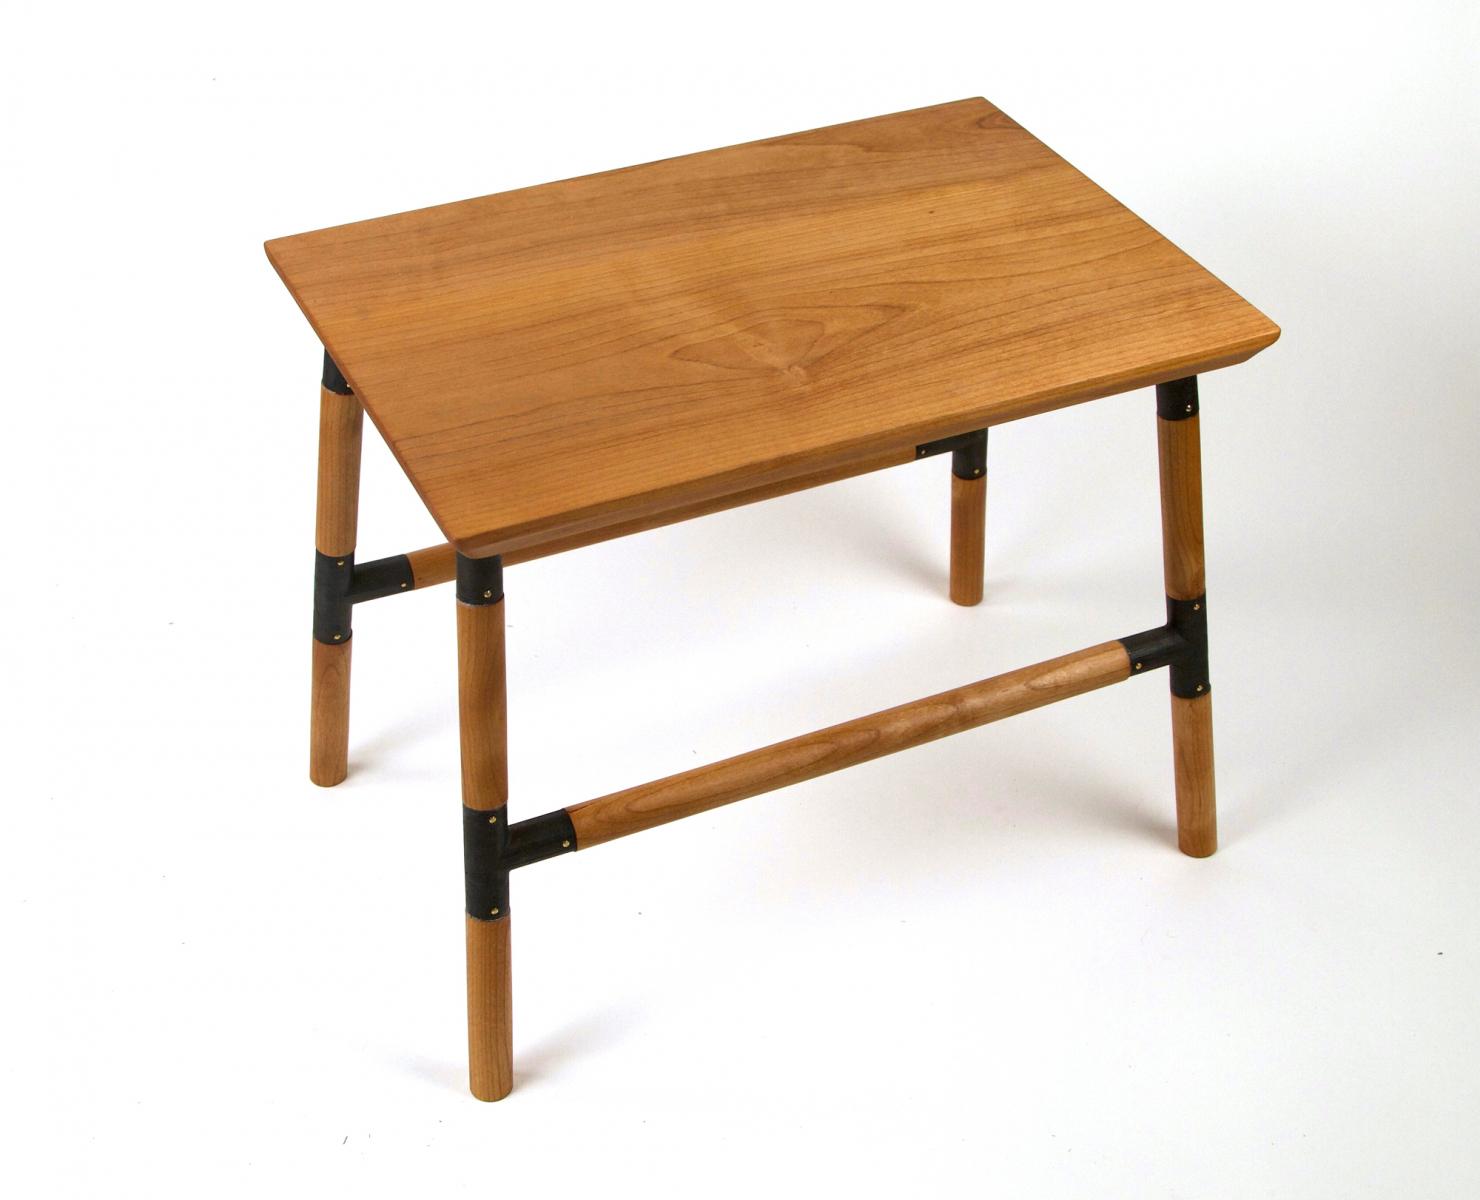 Table1_top_smaller